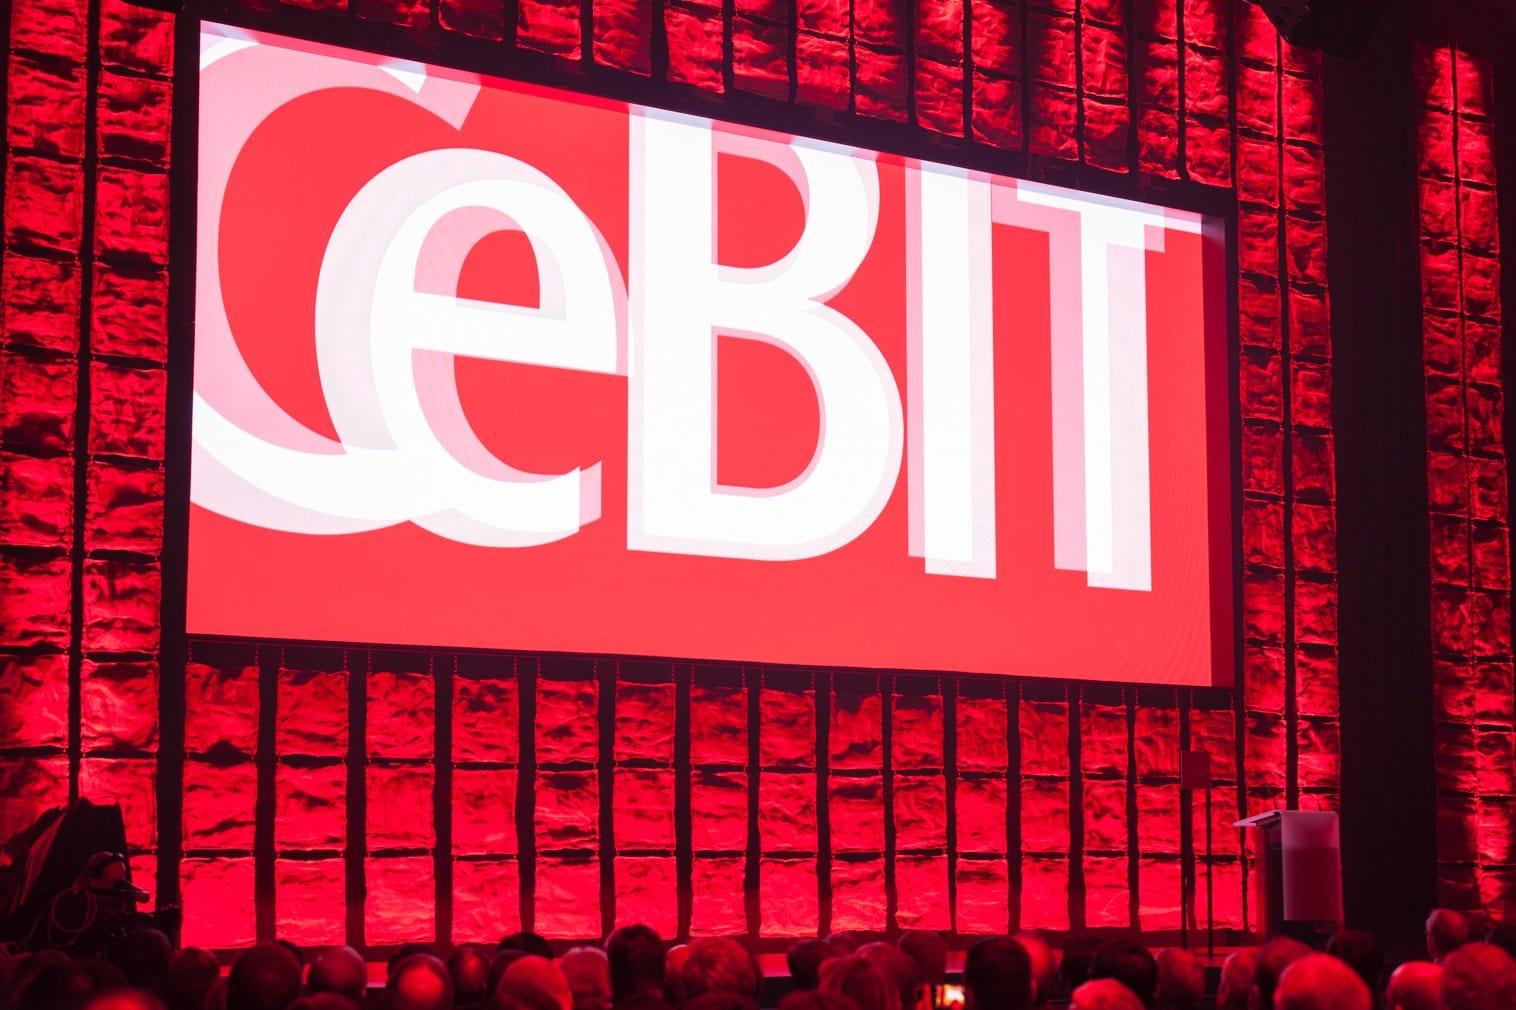 Cebit2017_hannover_ハノーバー